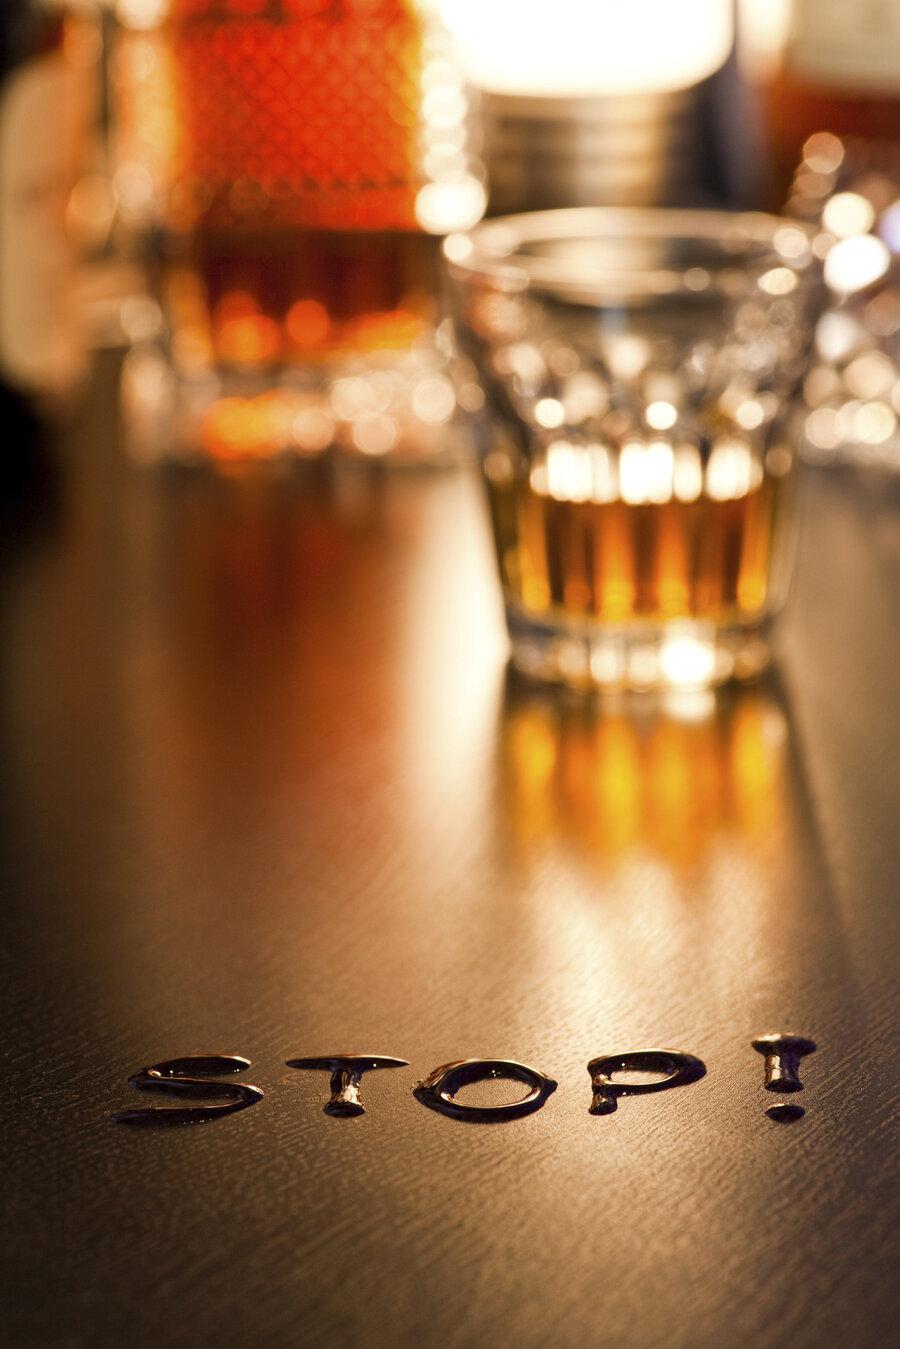 Alkoholprobleme?